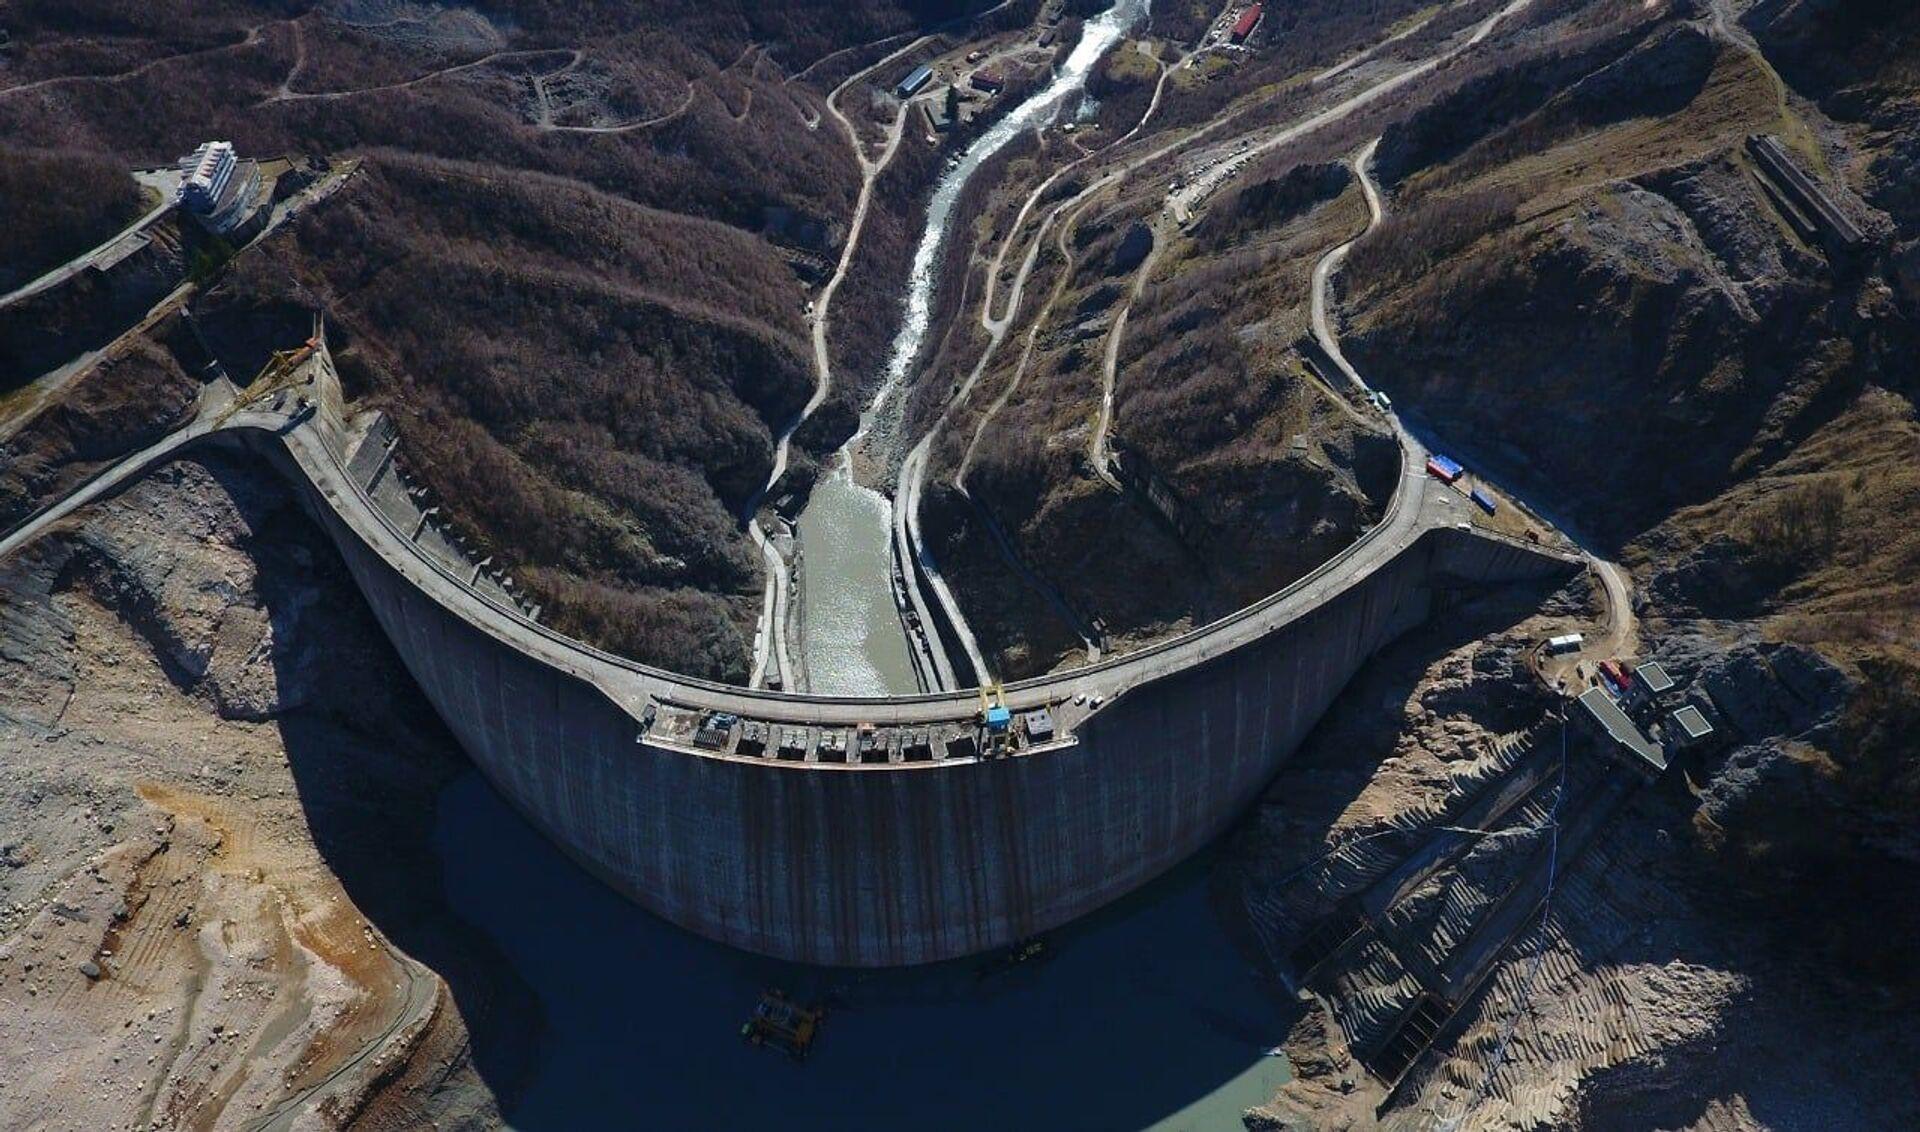 Ингури ГЭС - плотина и водохранилище в горах Земо-Сванети - Sputnik Грузия, 1920, 01.09.2021